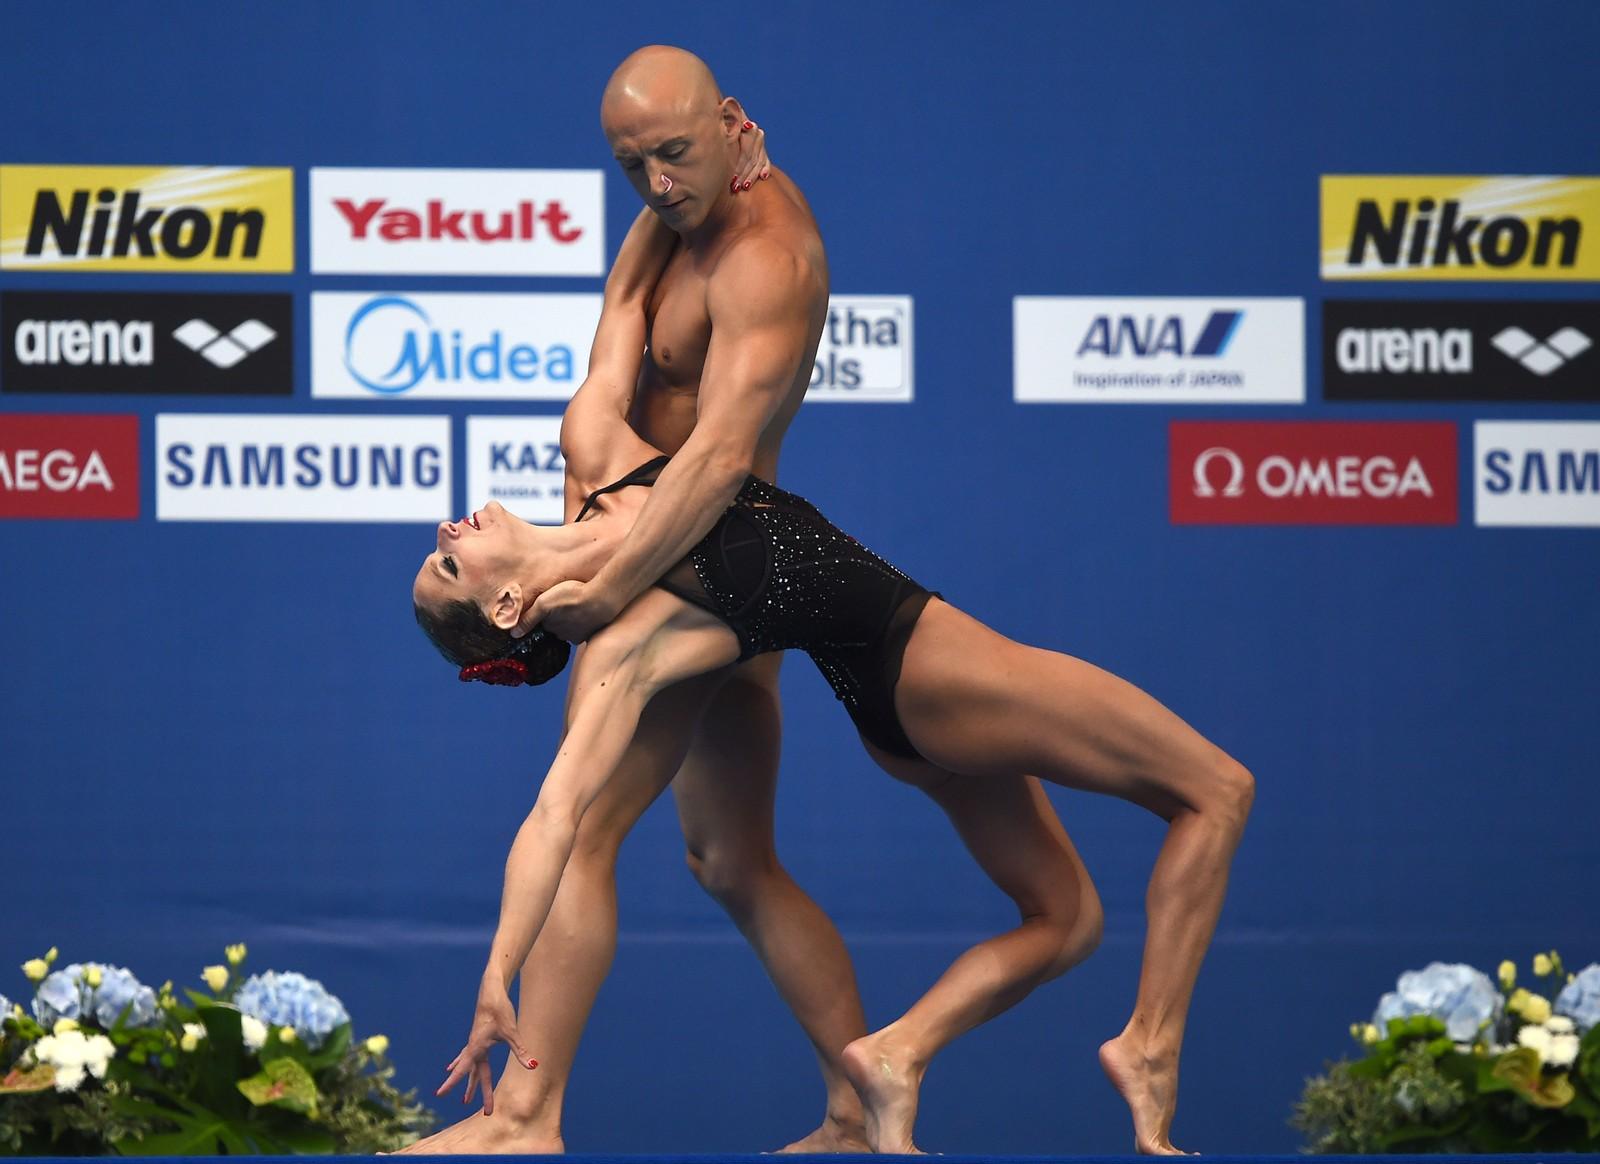 De franske synkronsvømmerne Virginie Dedieu og Benoit Beaufils under VM i svømmeidretter i Kazan.